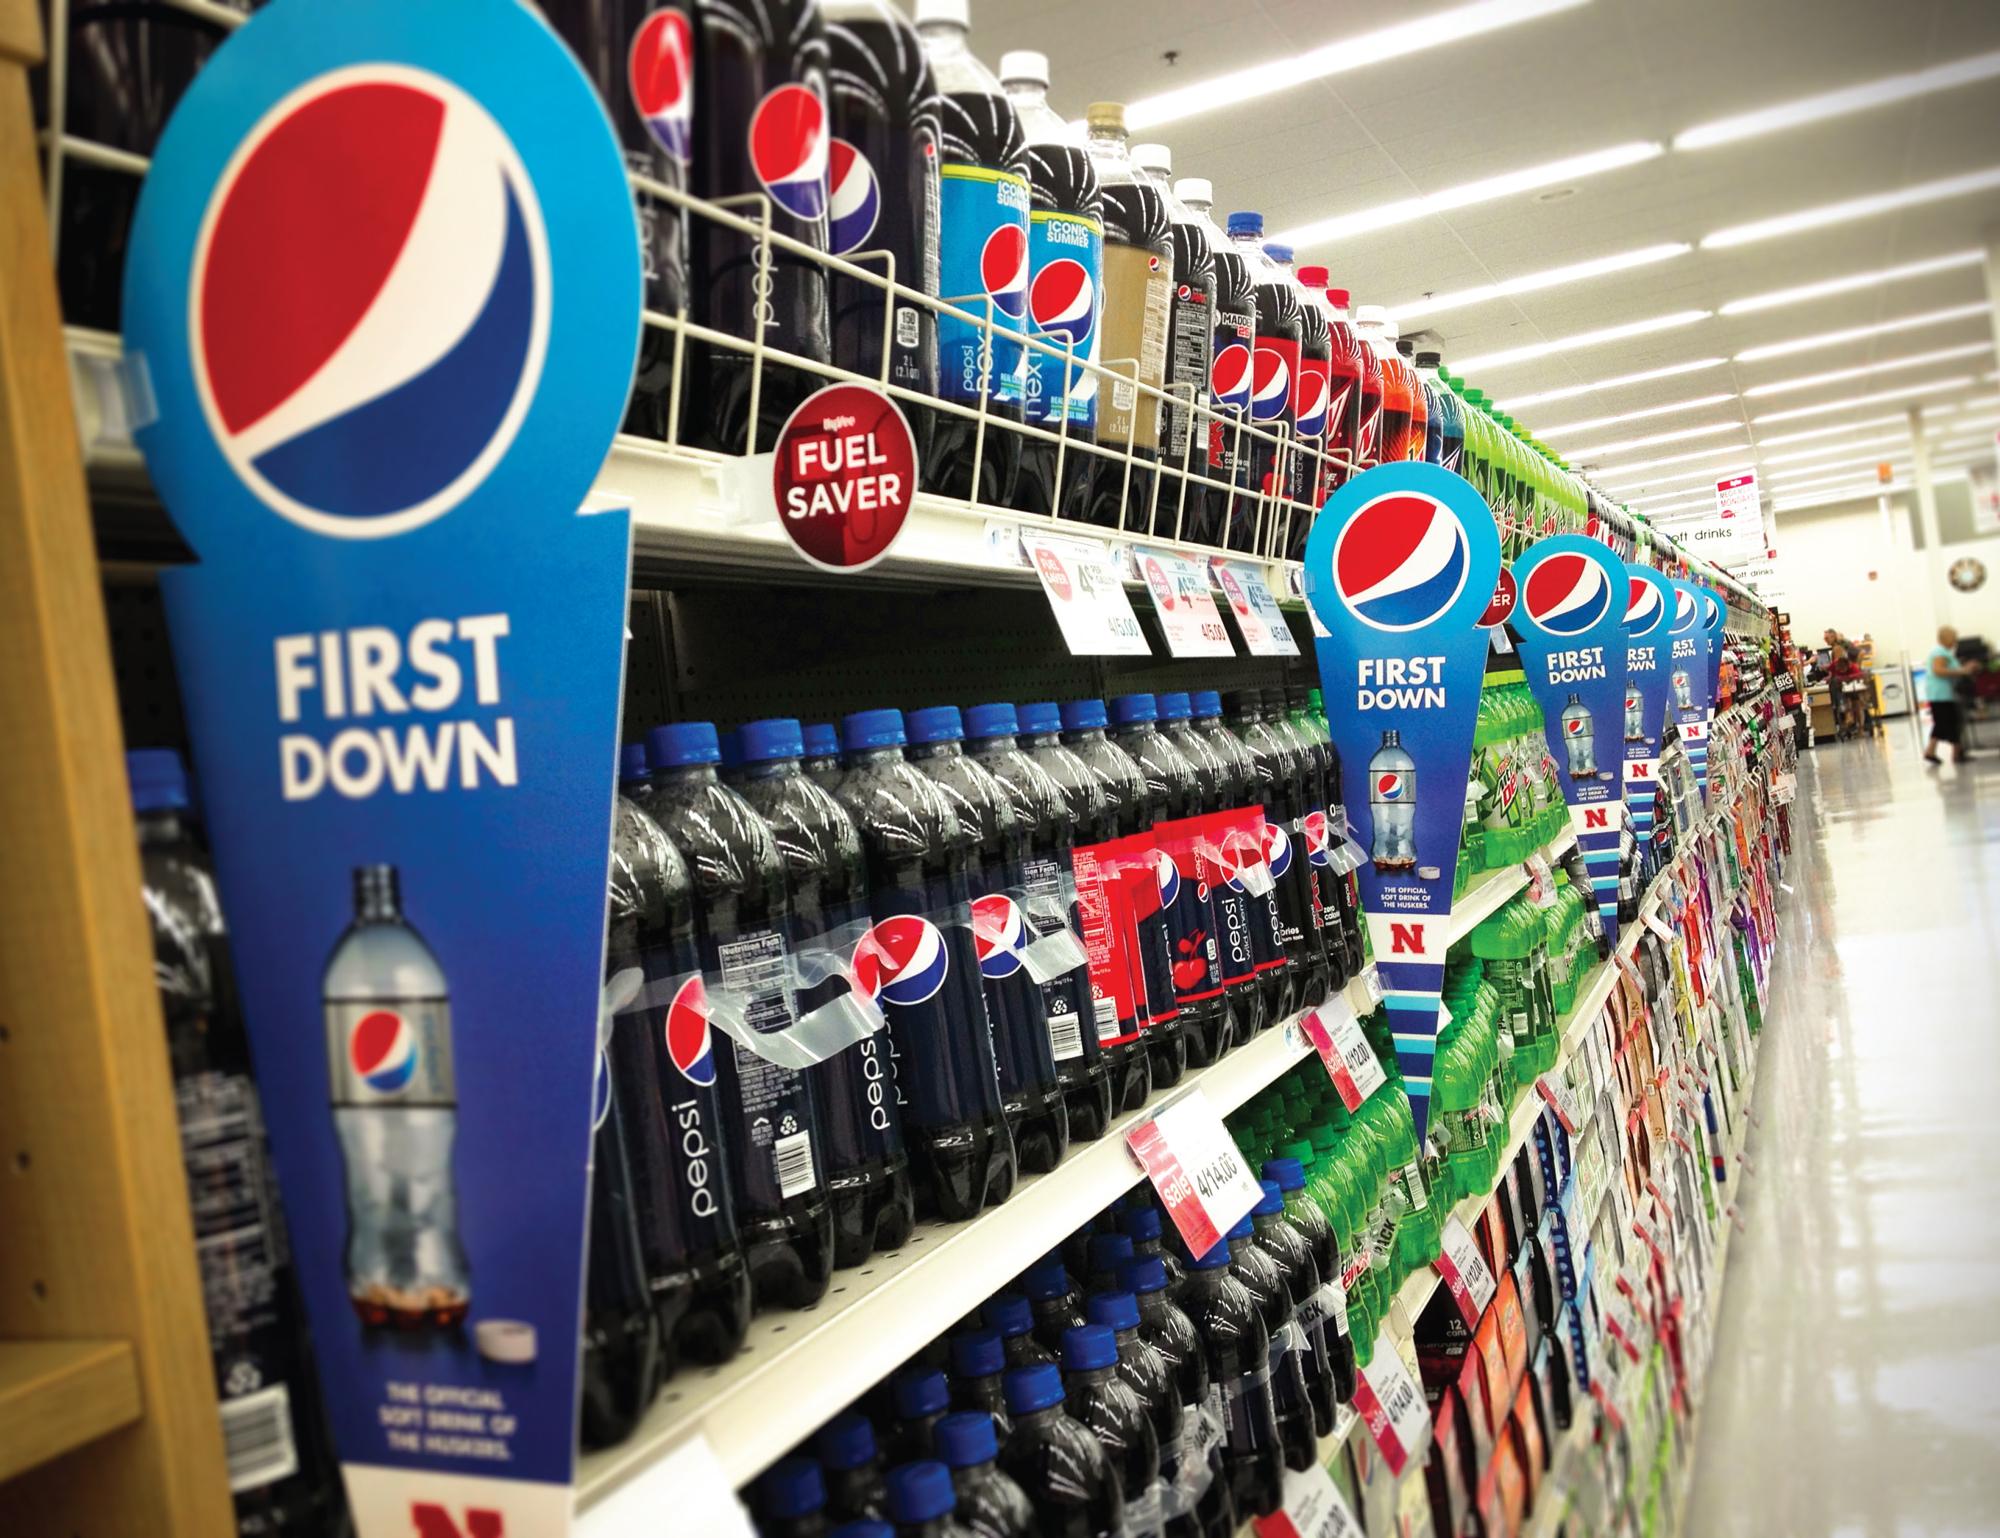 Pepsi_Firstdown_Shelftalker.jpg